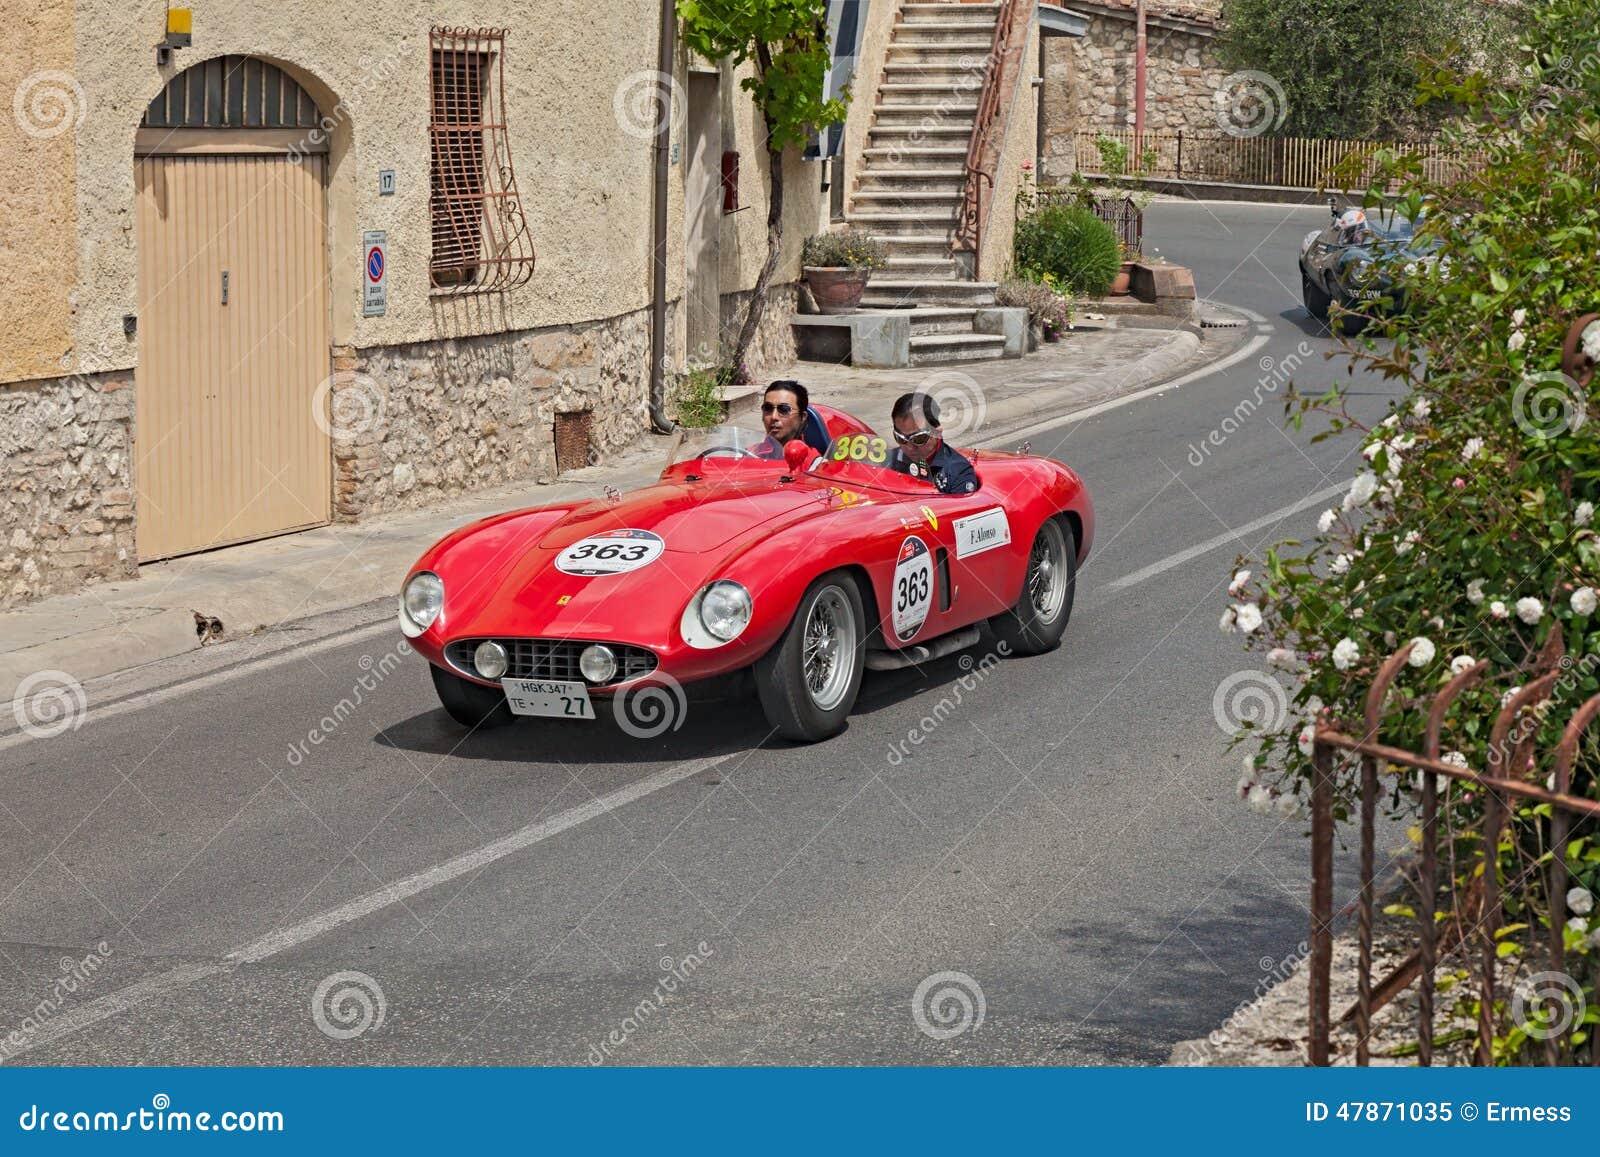 Паук Scaglietti Феррари 750 Монцы (1955) в Mille Miglia 2014